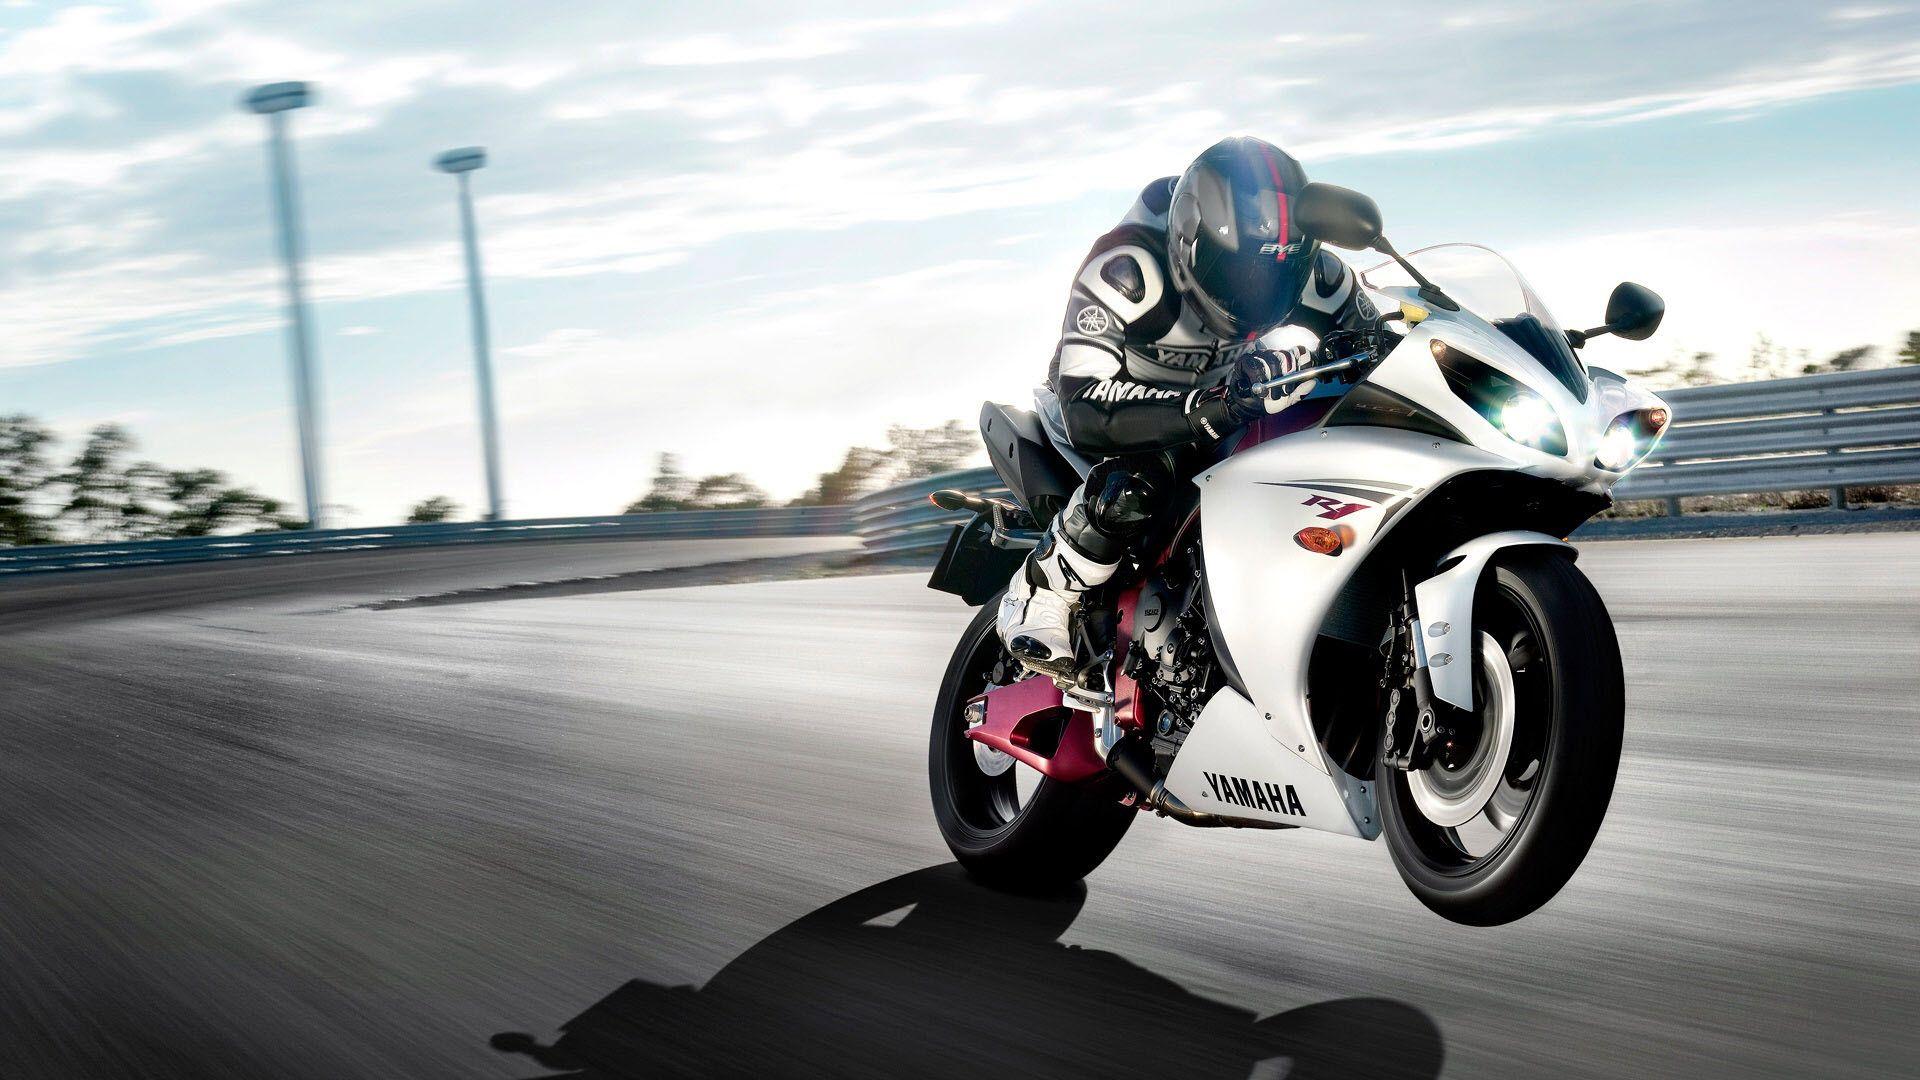 1395030 | Racing Bikes Wallpaper | Pinterest | Yamaha bikes and ...